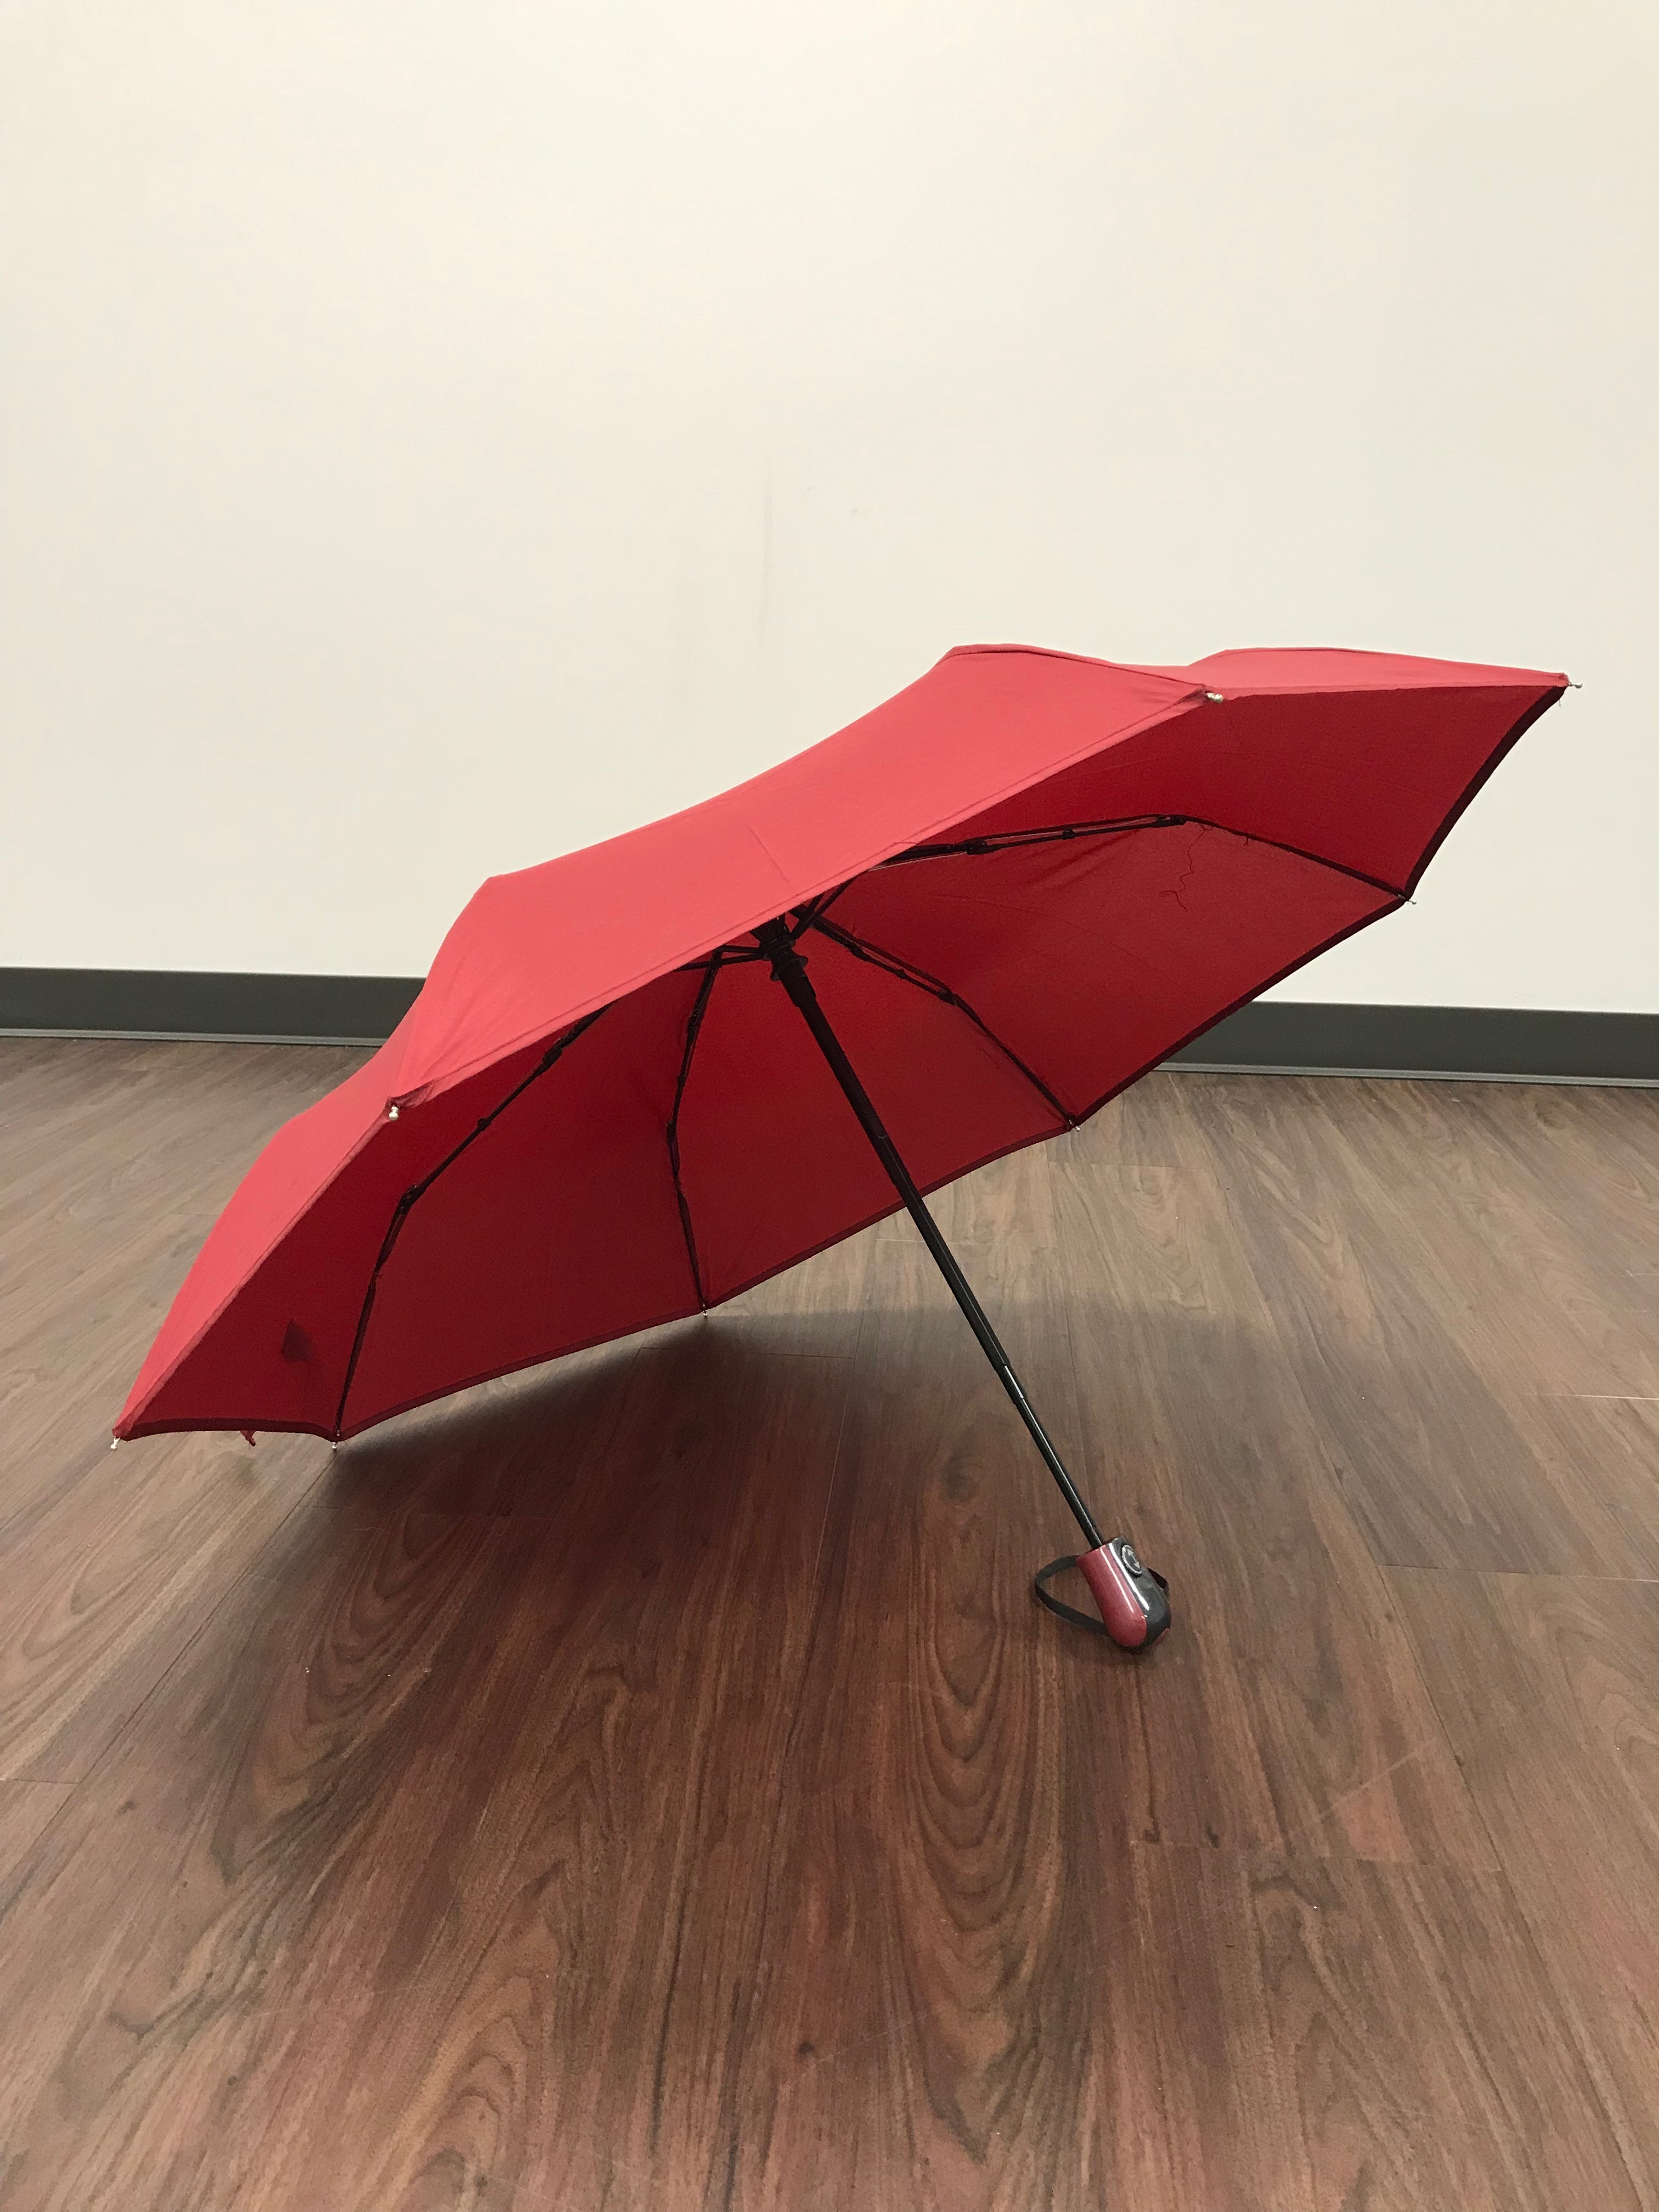 Image for the Maroon Folding Umbrella, No Design product